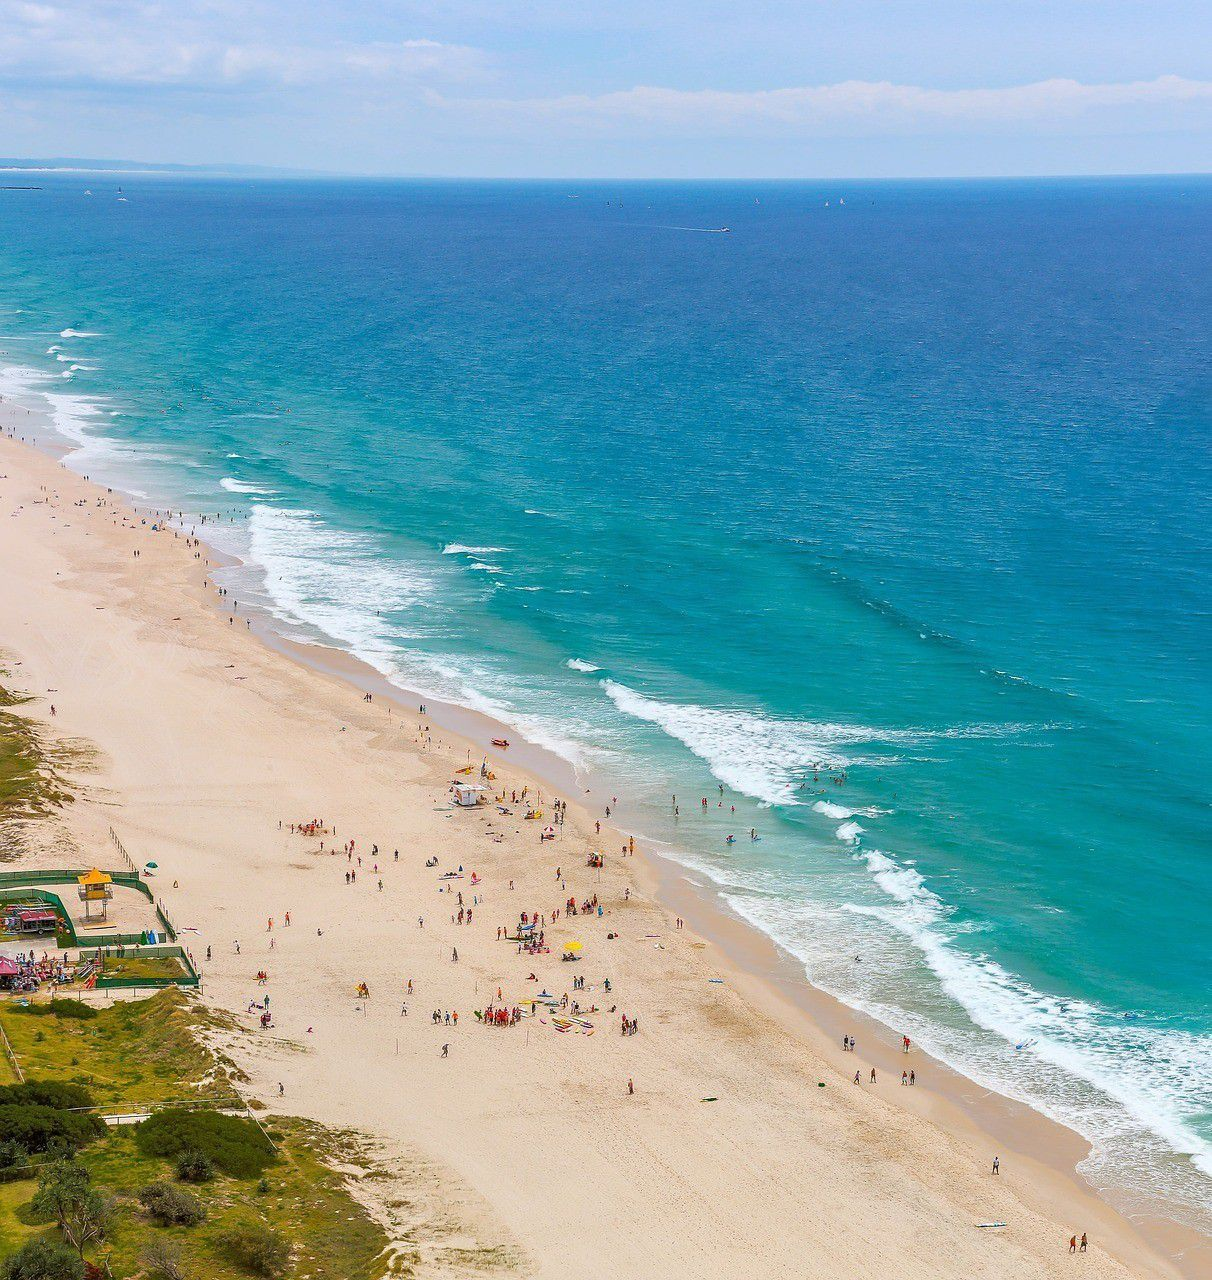 Gold Coast, Australia - Where is hot in January